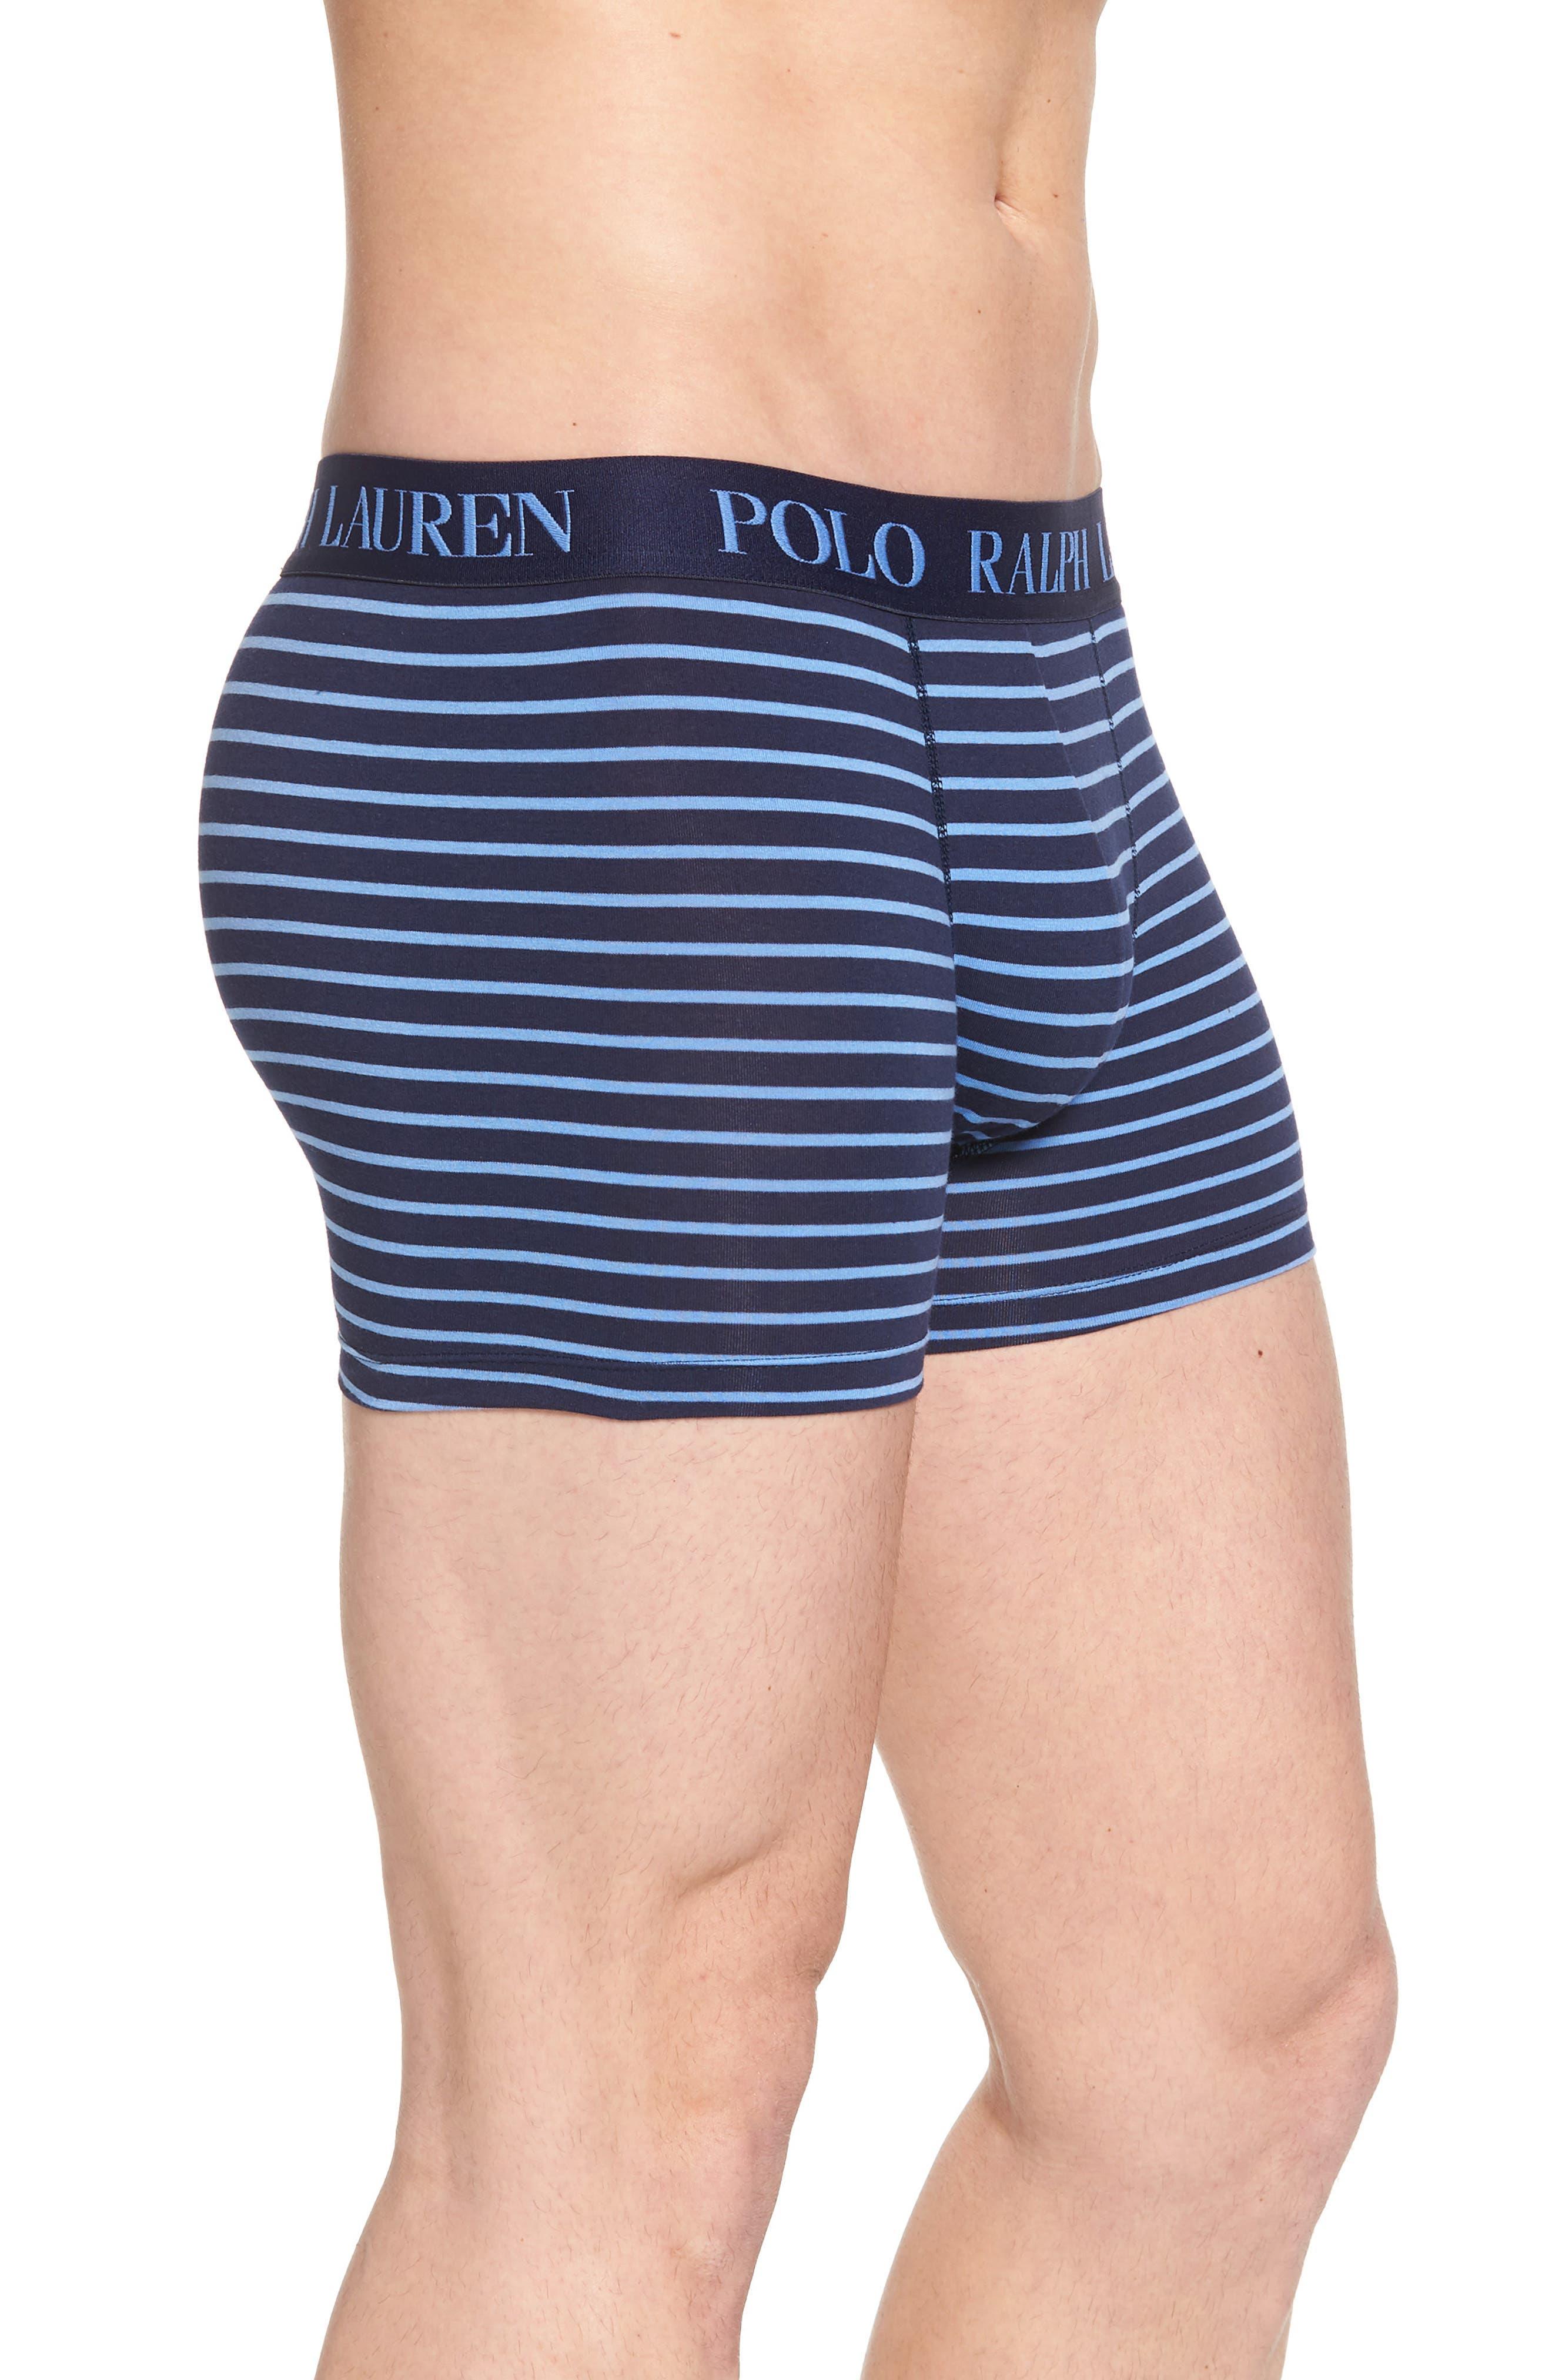 2-Pack Comfort Cotton Boxer Briefs,                             Alternate thumbnail 4, color,                             Cruise Navy/ Harbour Island